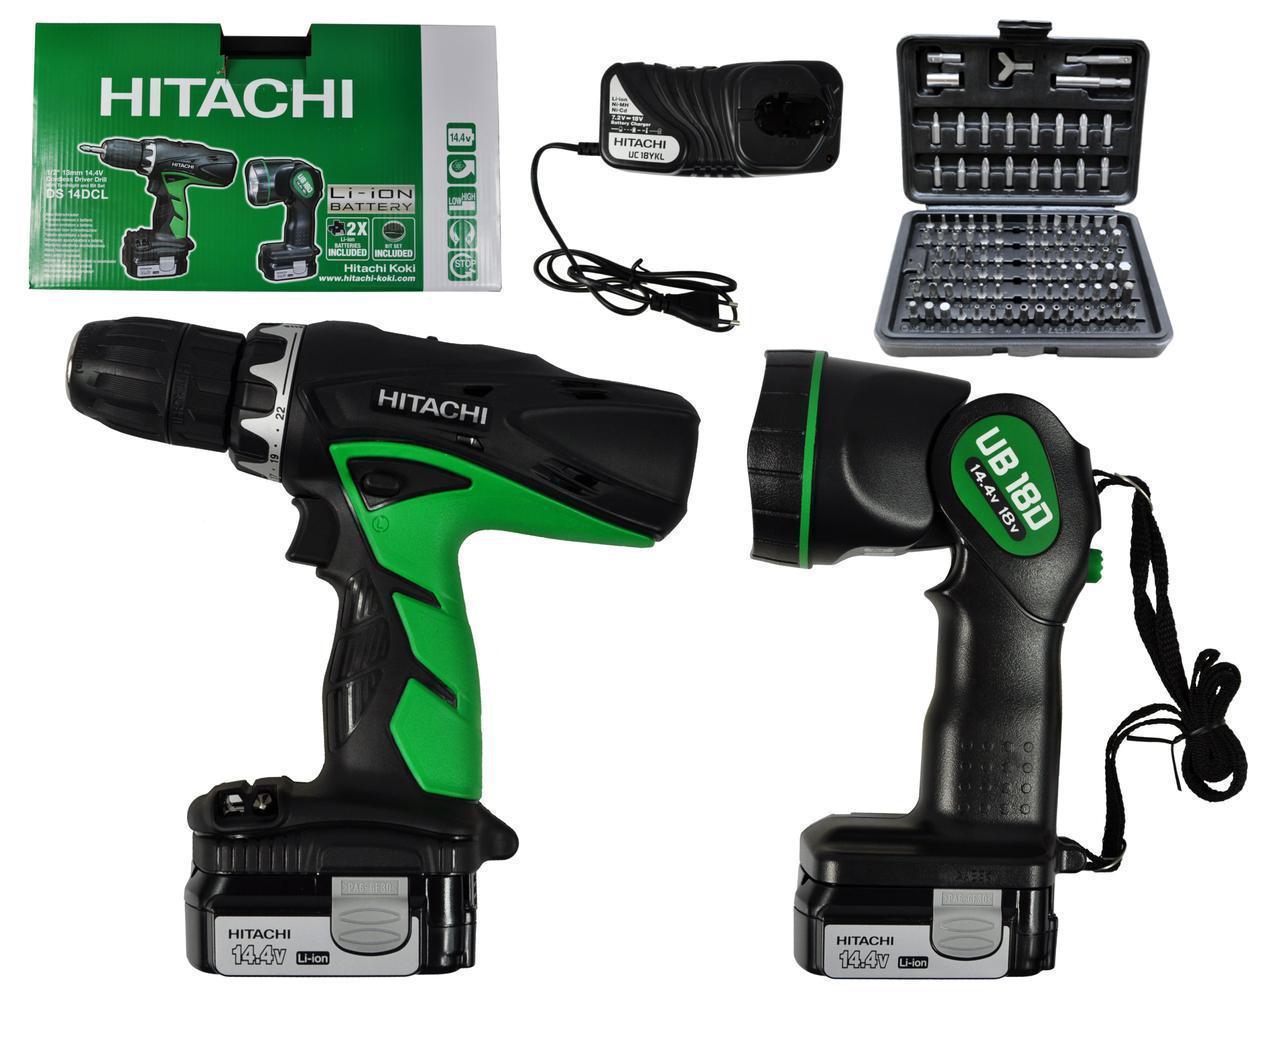 Дрель-шуруповерт HITACHI DS14DCL + фонарь + набор бит 100 шт